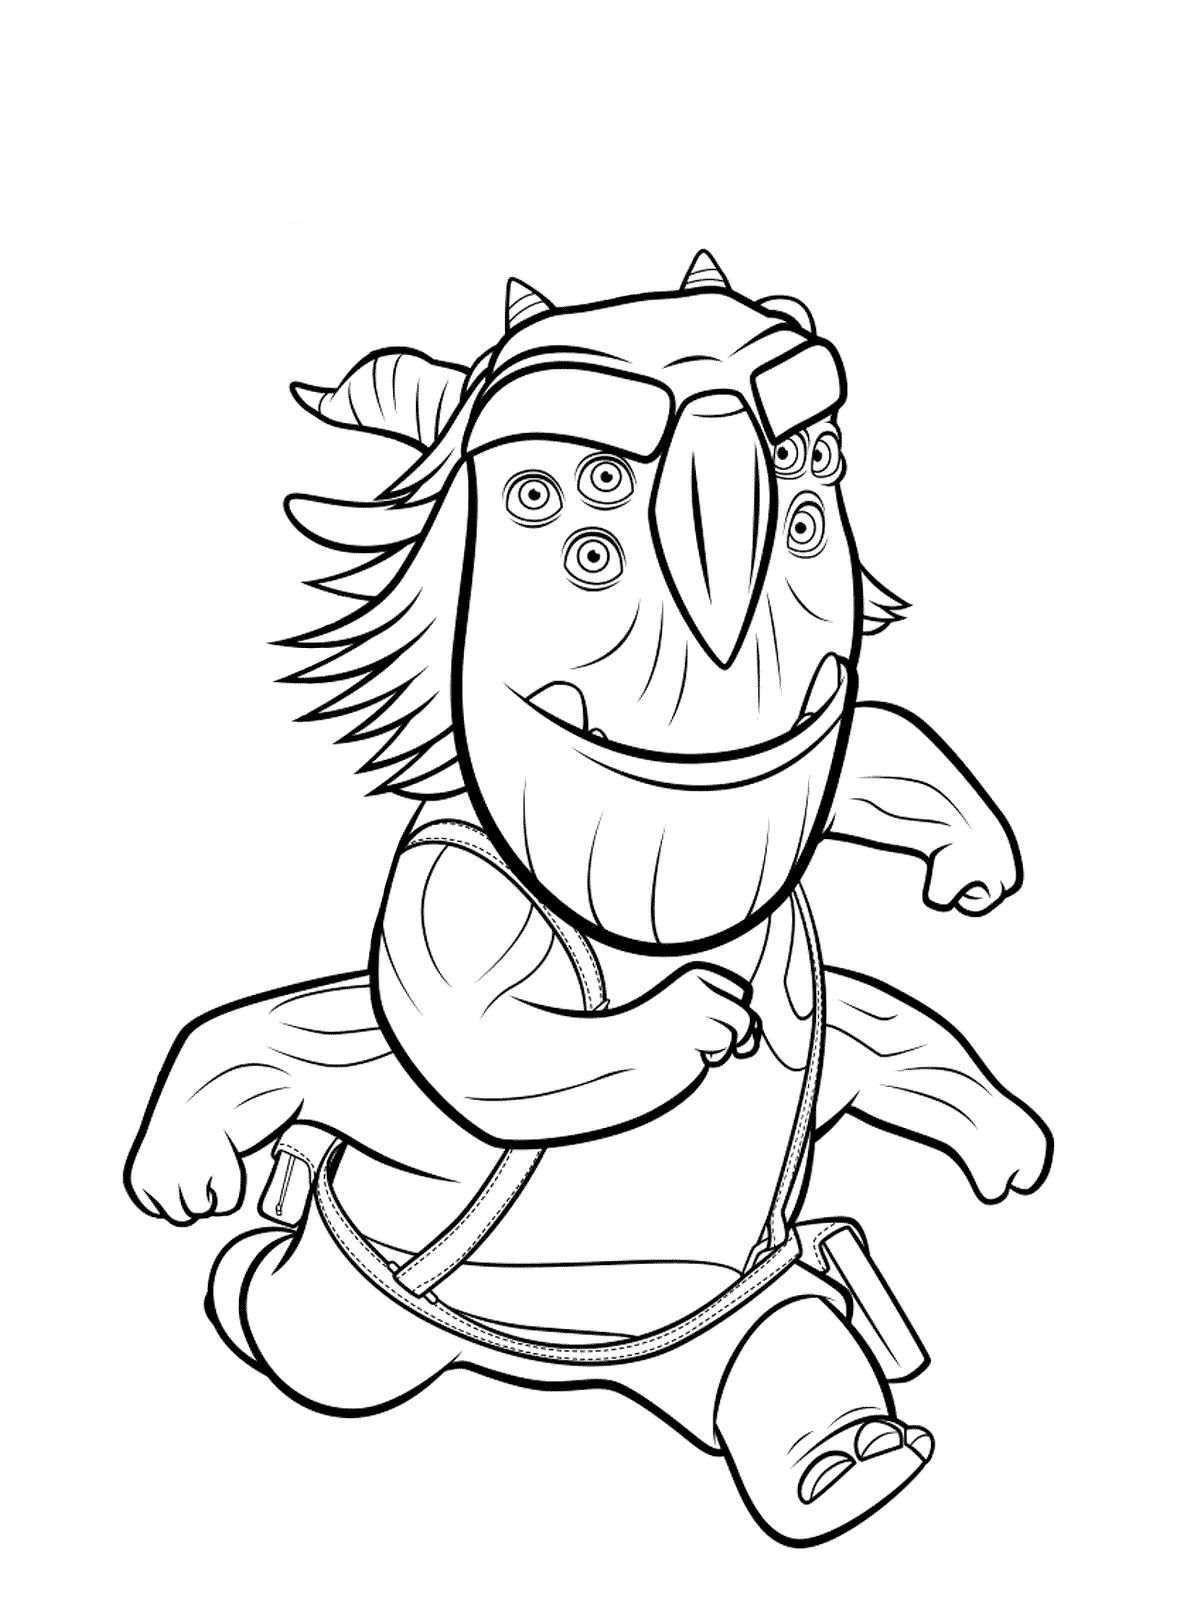 10 coloring pages of Trollhunters on Kids-n-Fun.co.uk. Op